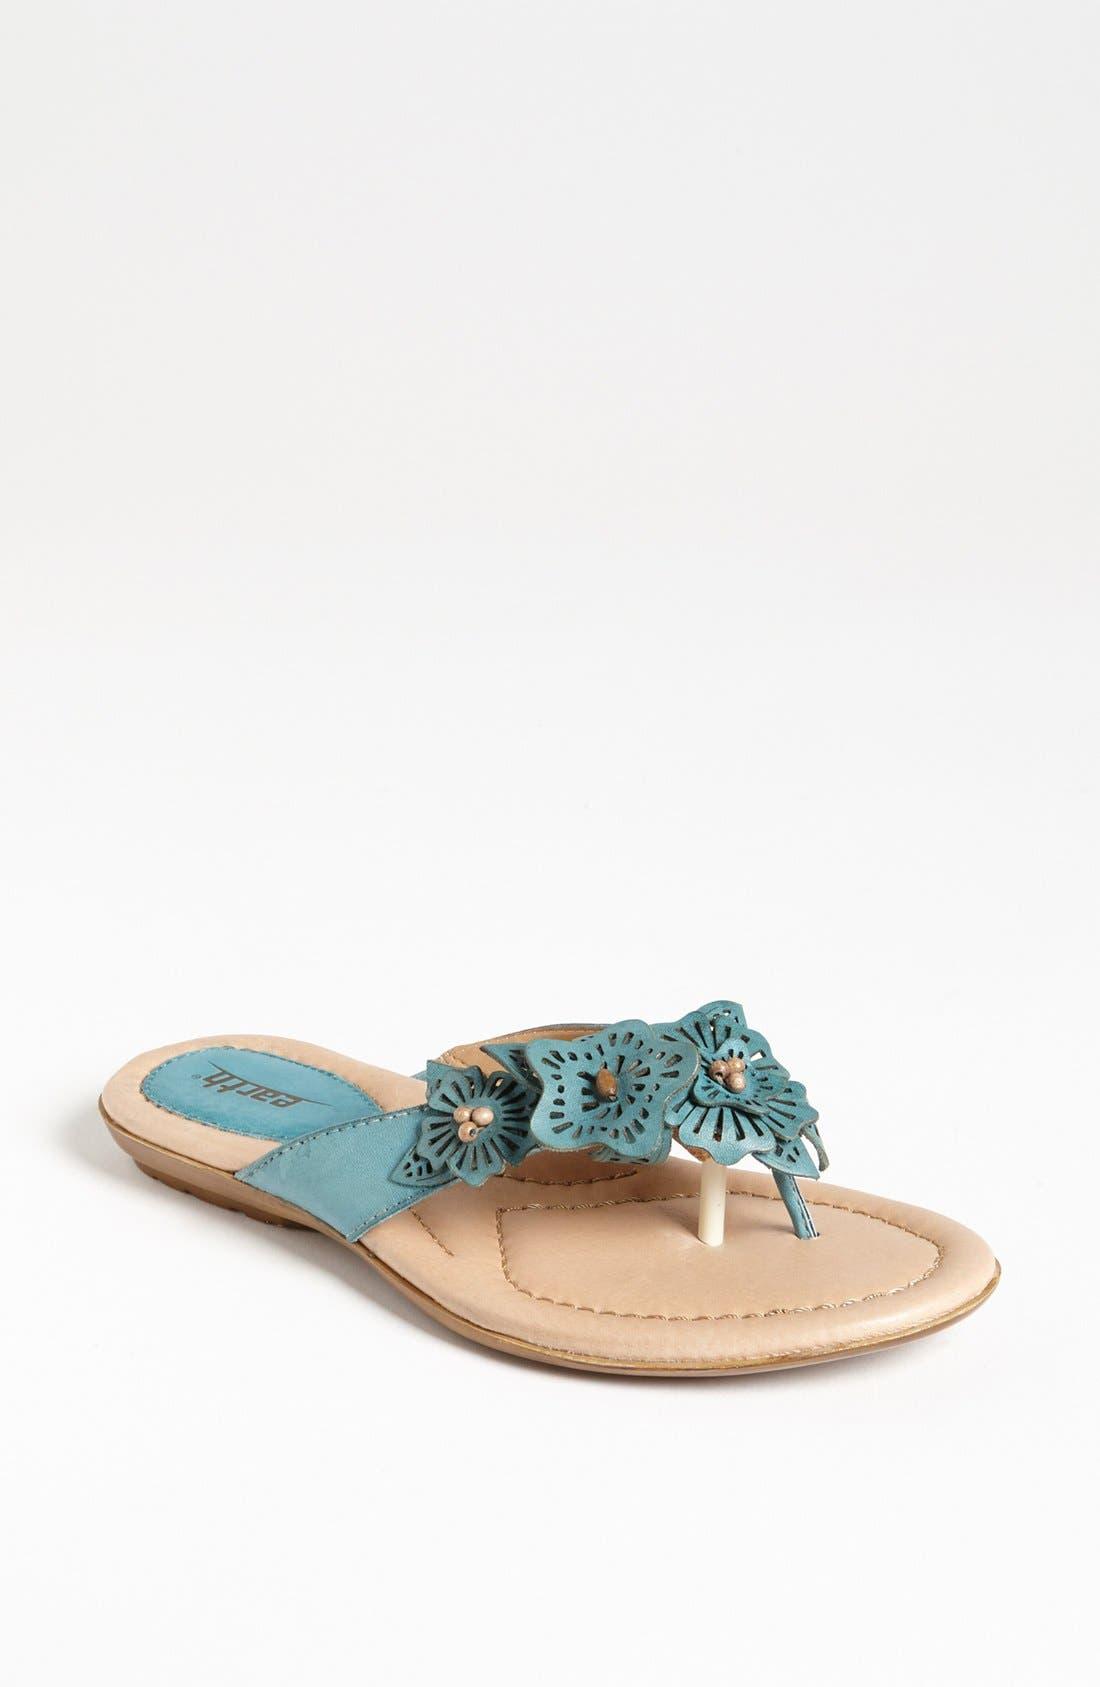 Main Image - Earth® 'Breeze' Sandal